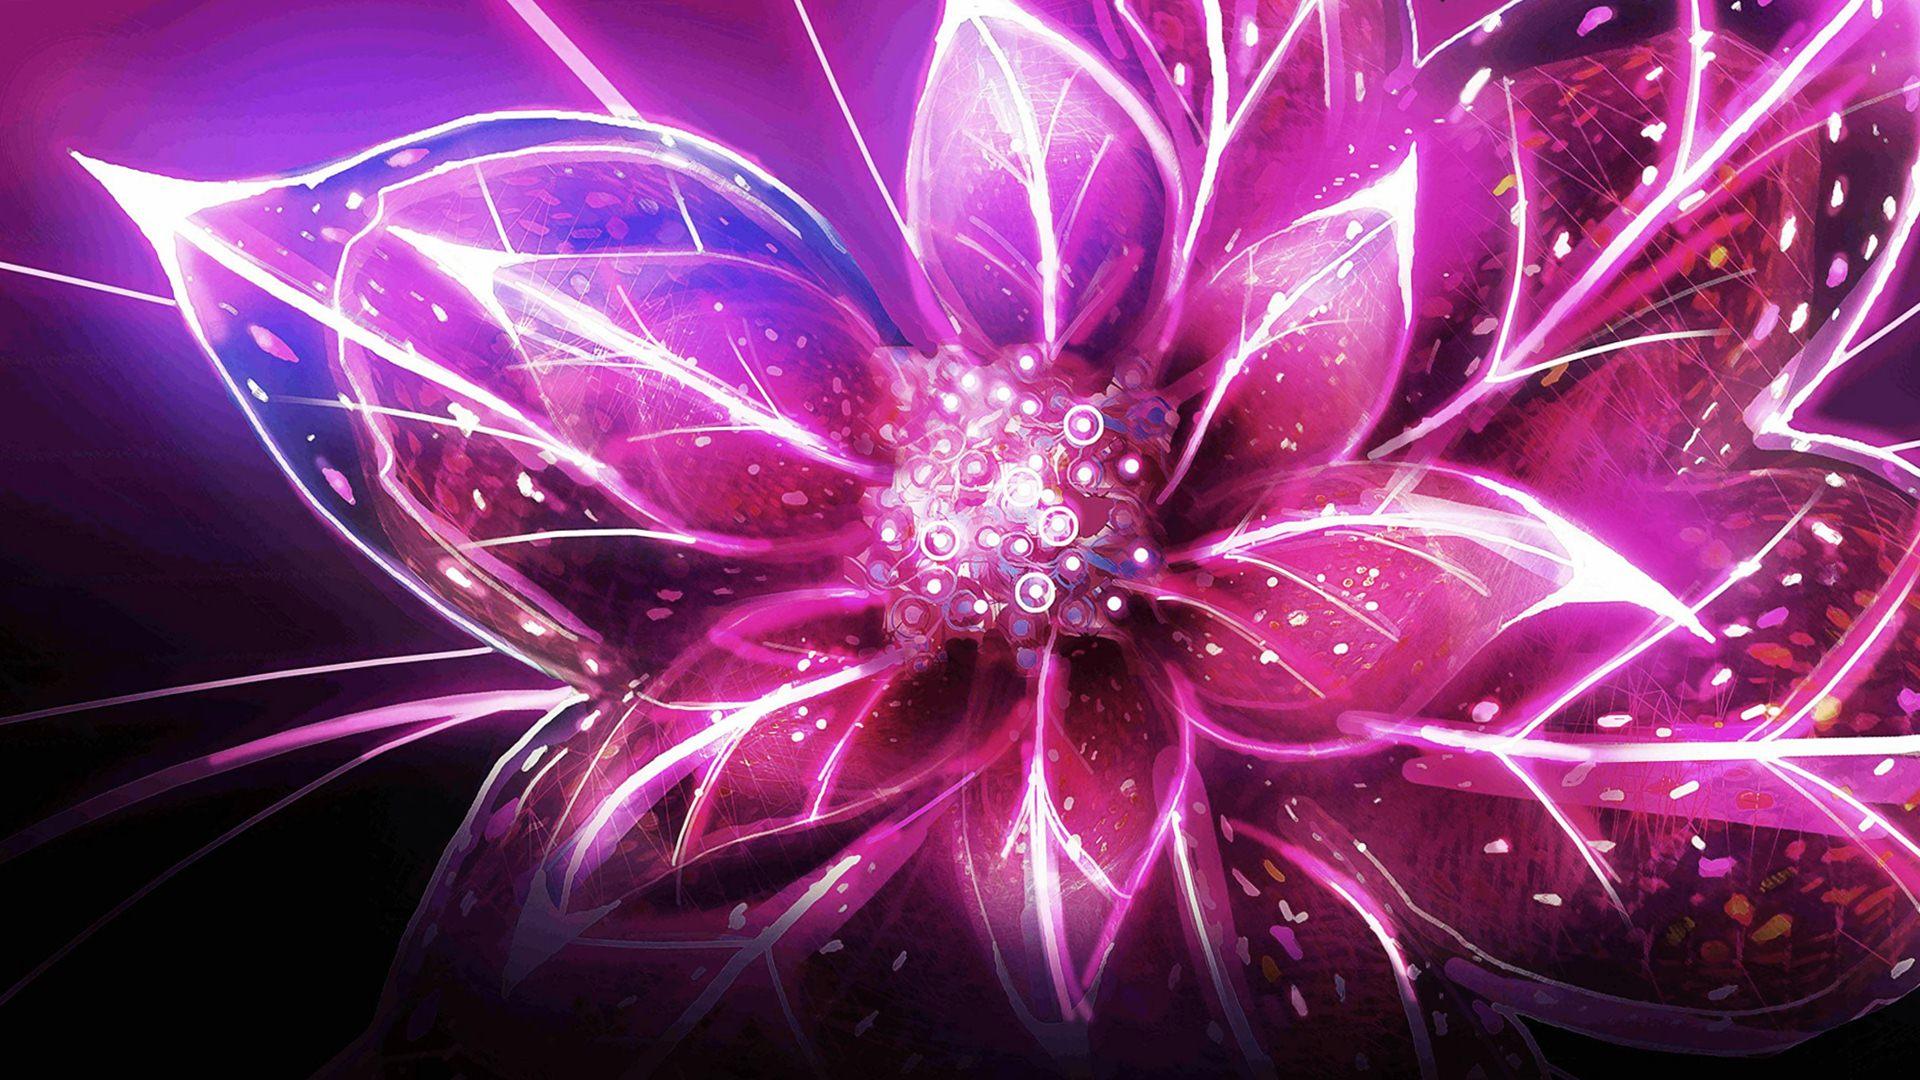 image - flowers-3d-diugital-purple-wallpapers   fantastic